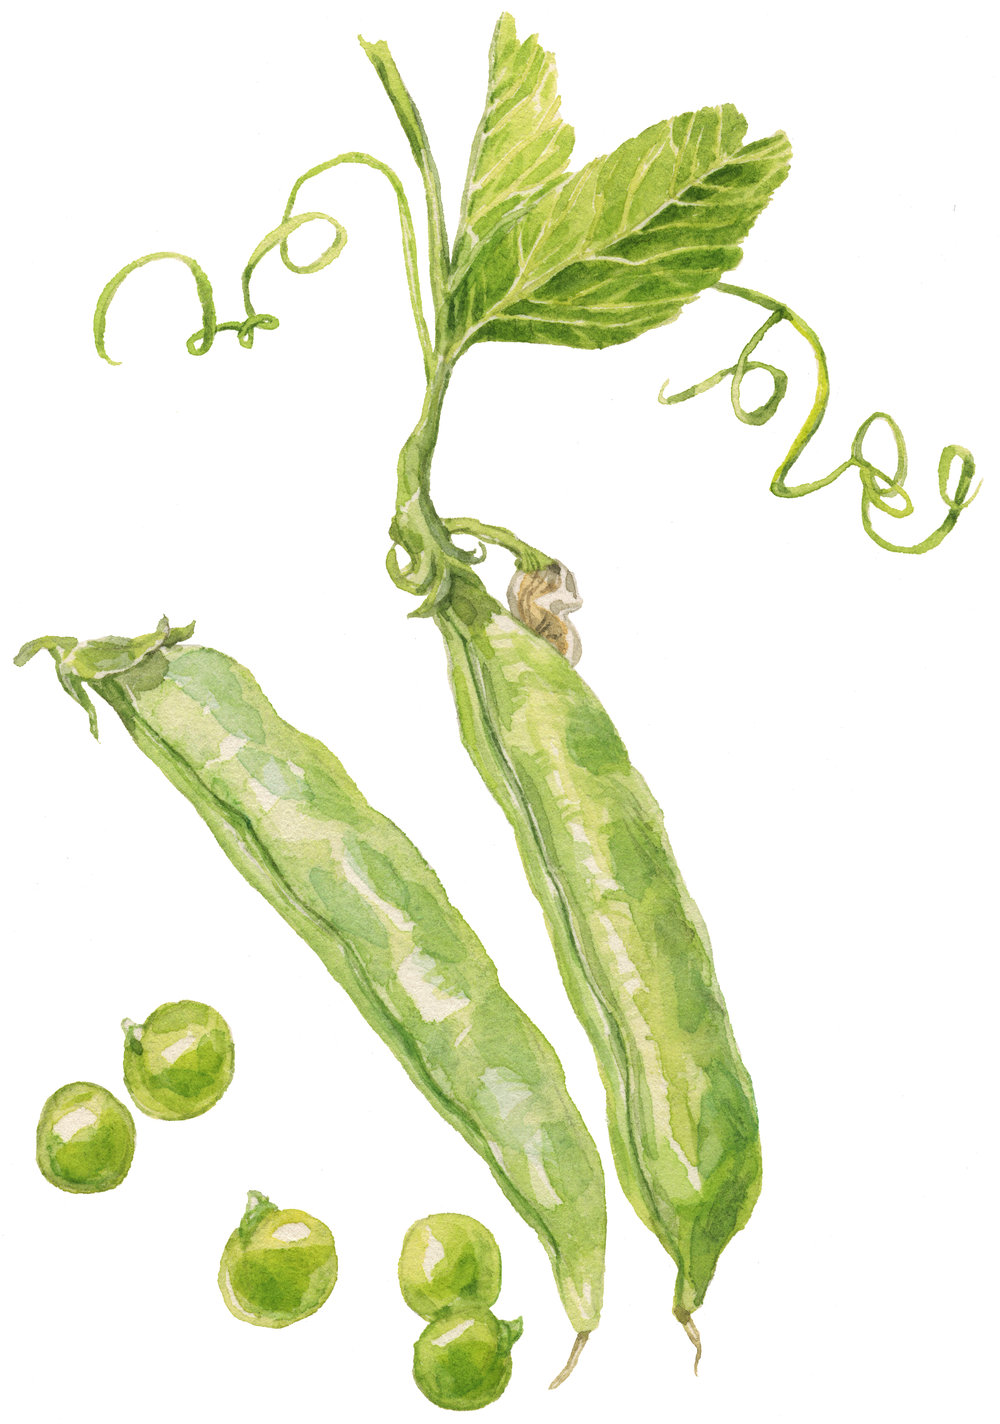 3-english-peas-lrg.jpg